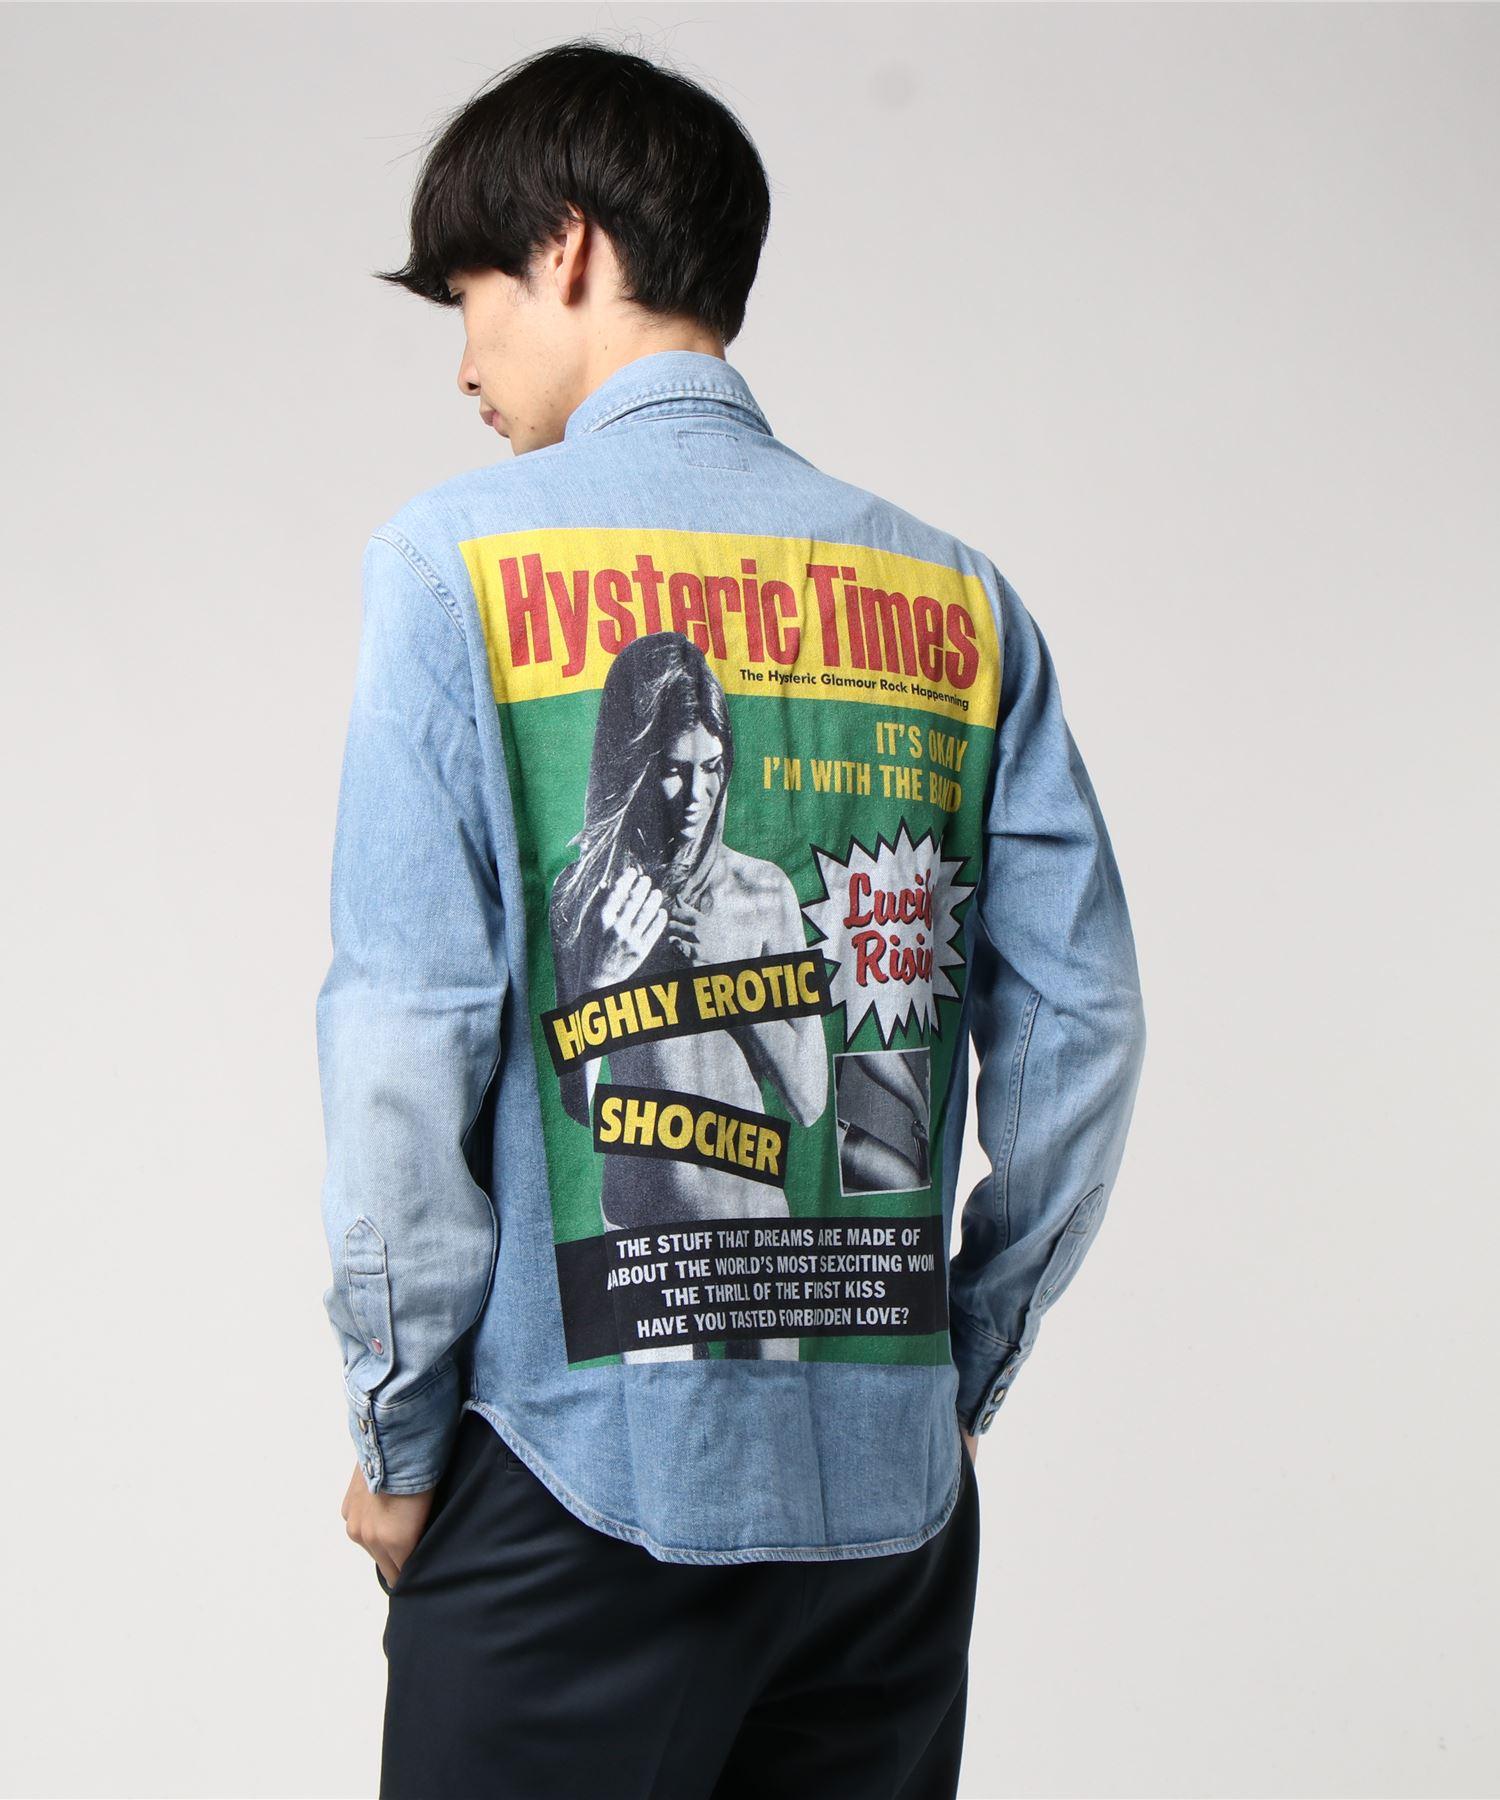 HYSTERIC TIMES デニム長袖ウエスタンシャツ